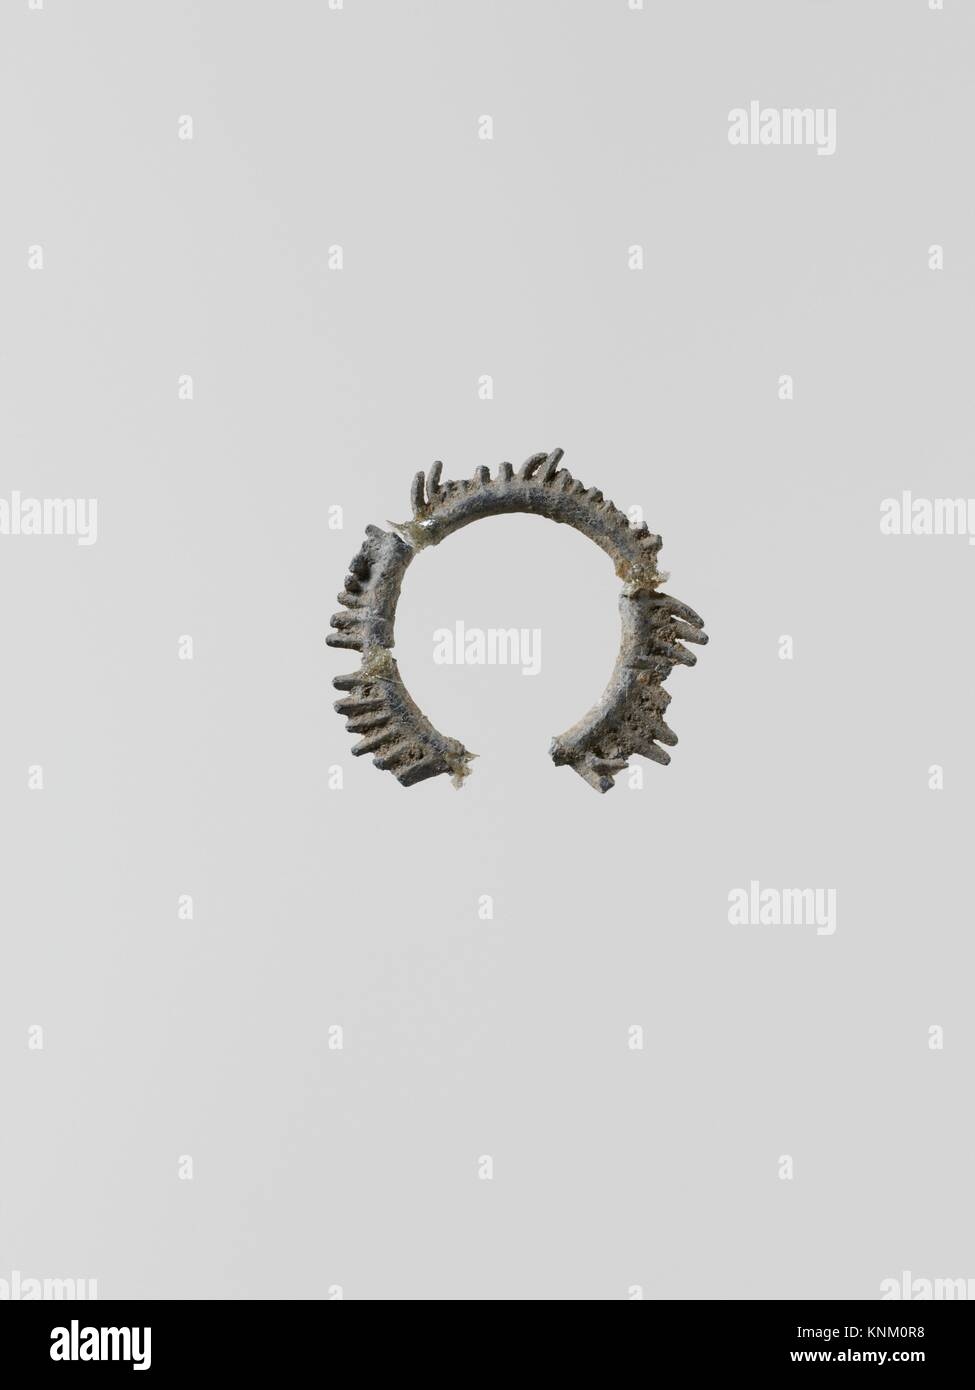 Wreaths, 11. Culture: Greek, Laconian; Medium: Lead; Dimensions: 4 fragments; Classification: Miscellaneous-Lead; Stock Photo